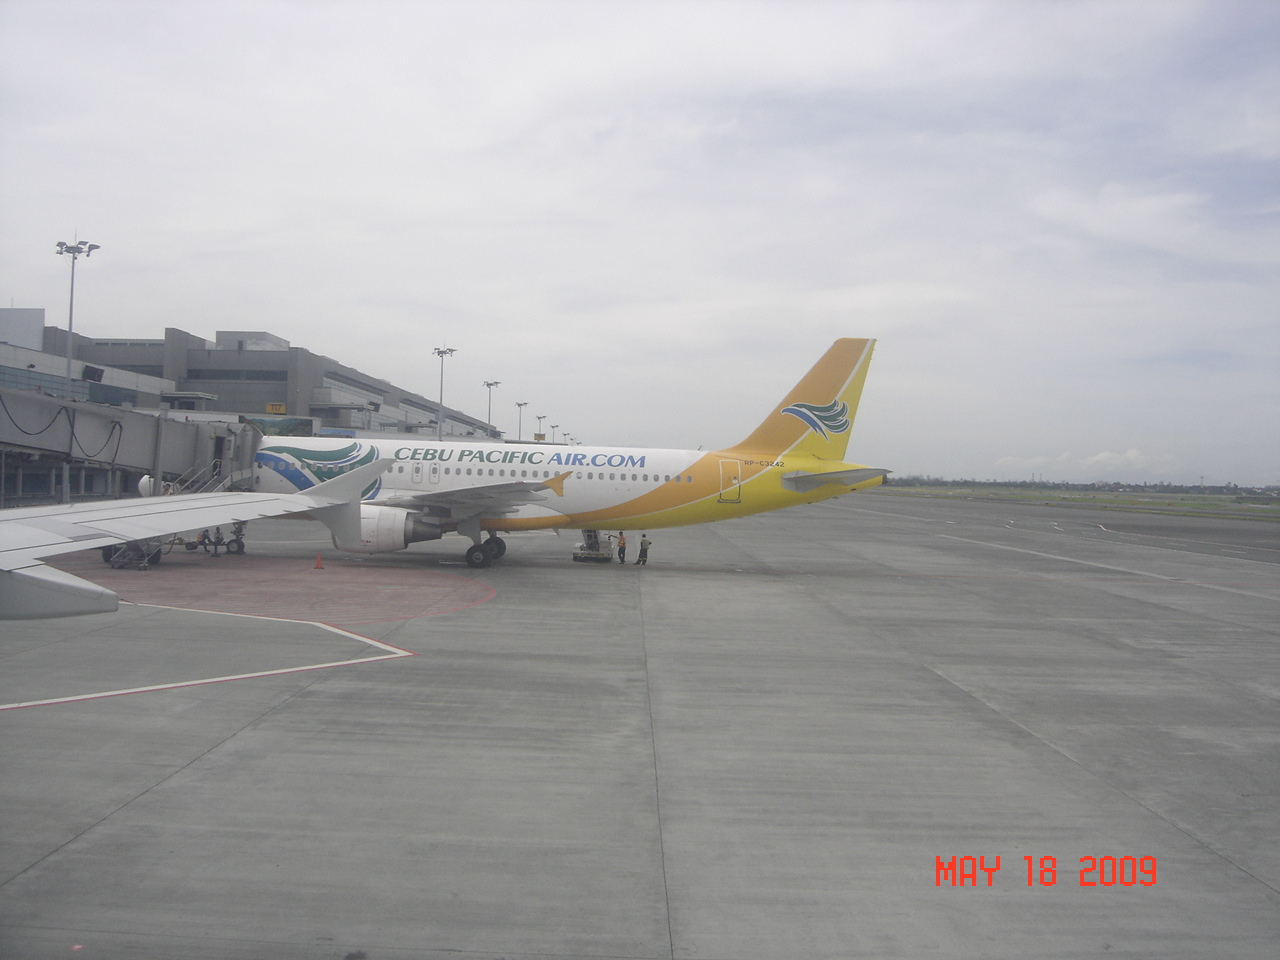 Cebu Pacific Air Airbus A320  Ninoy Aquino International